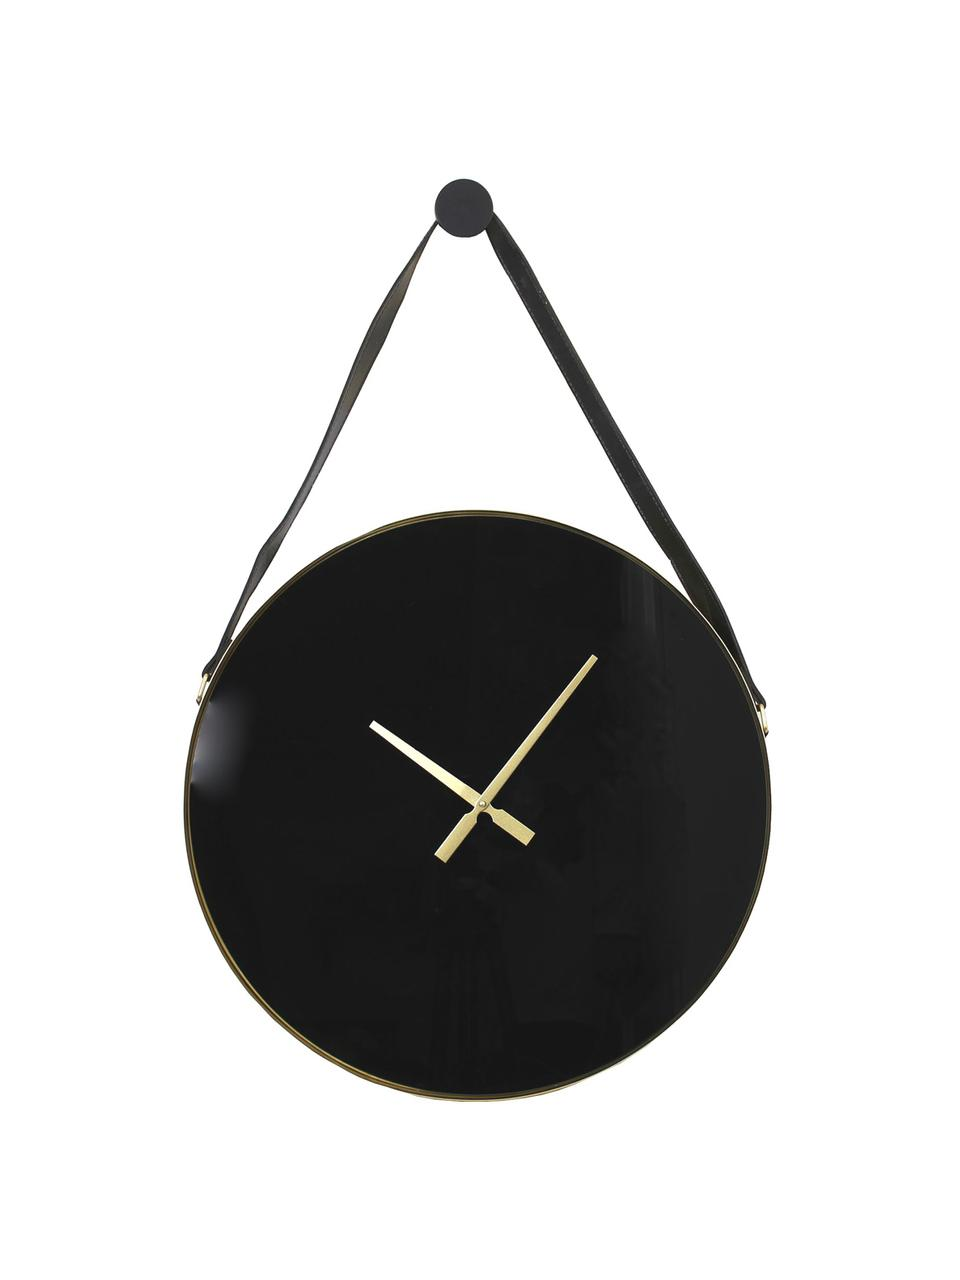 Grande horloge murale ronde Liva, Noir, couleur dorée